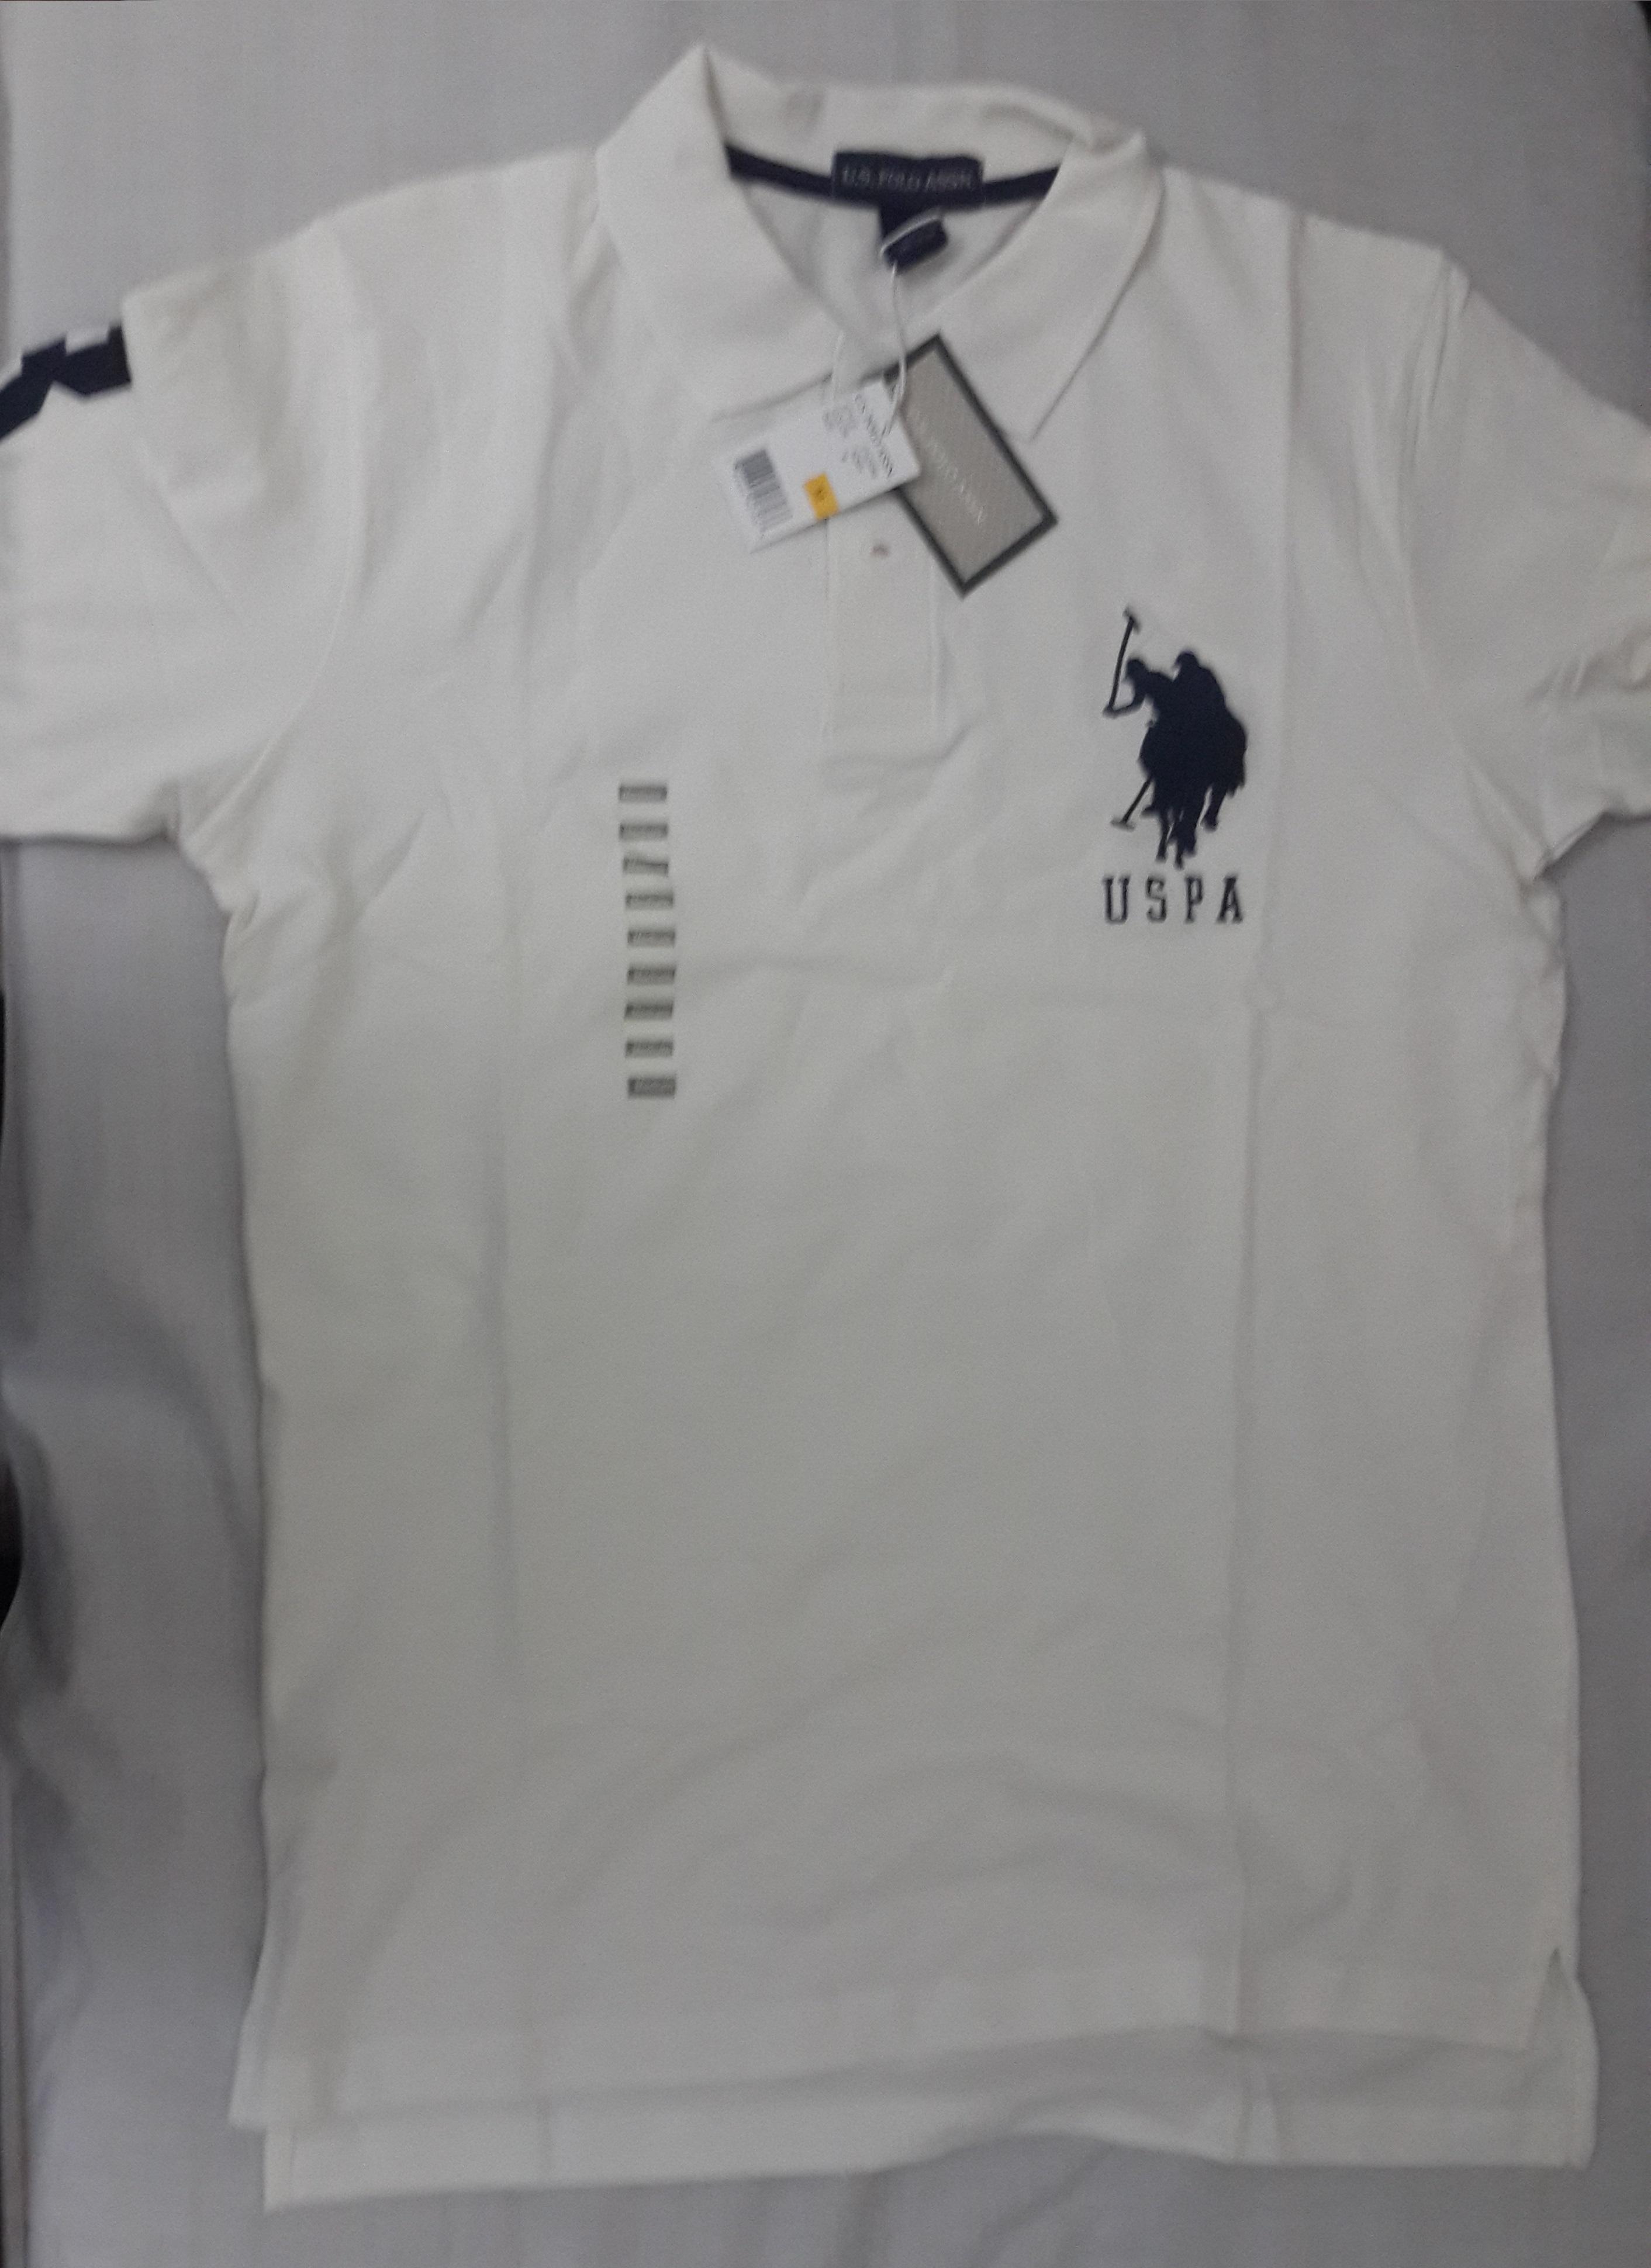 b61264fab New Original US Polo T-shirt for sale